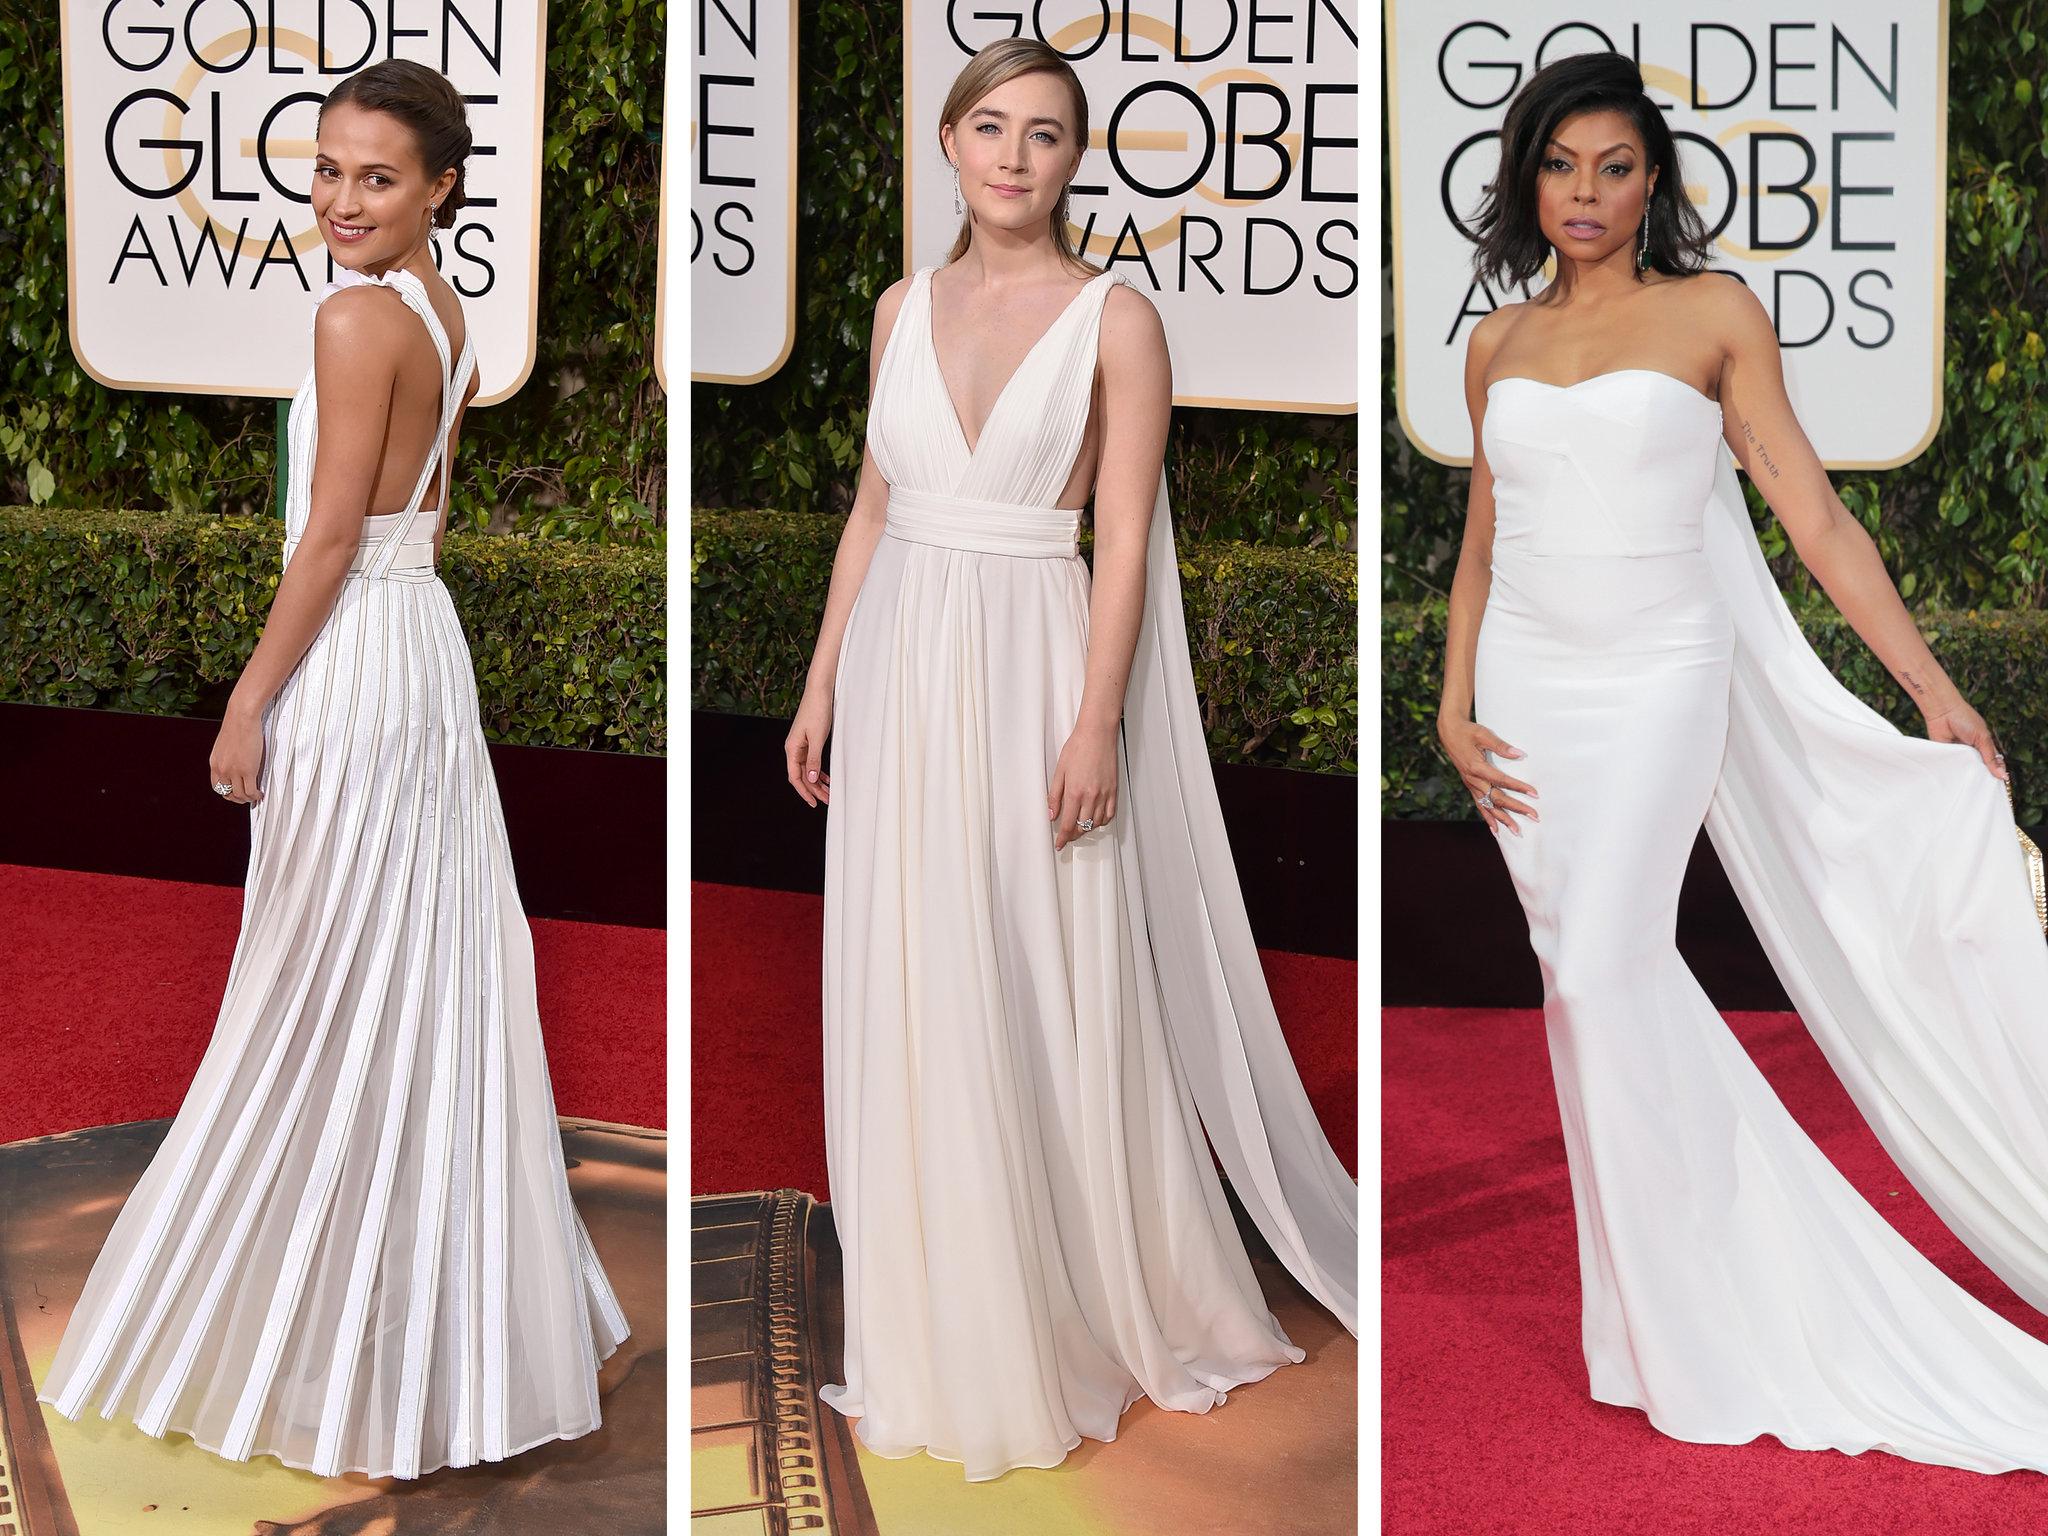 Golden Globe Awards 2016 Winners List Amp Pictures